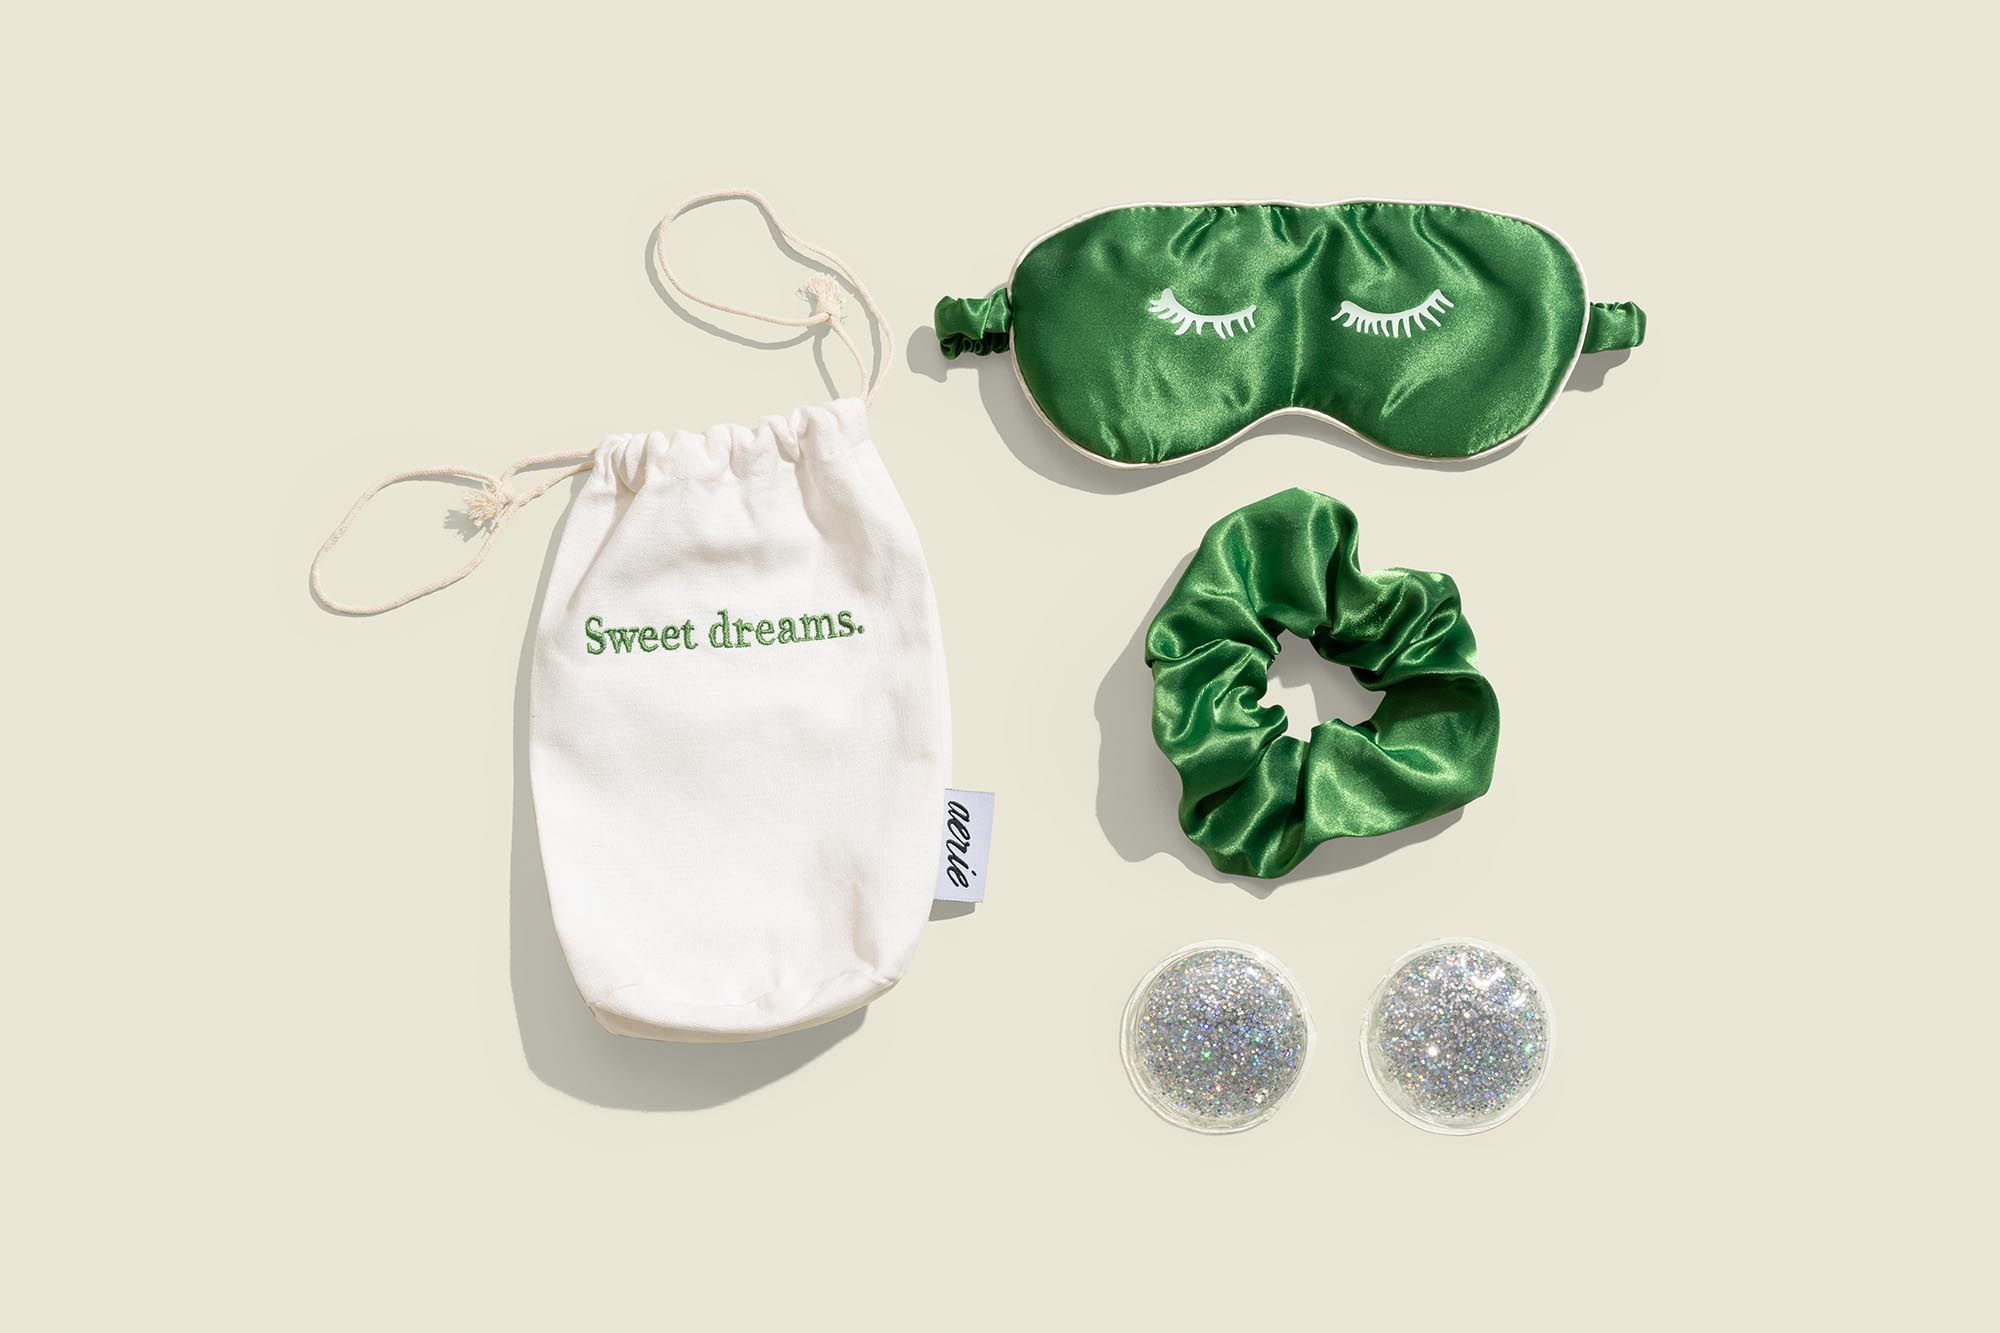 Drawstring pouch with scrunchie, sleep mask and glitter eye gel